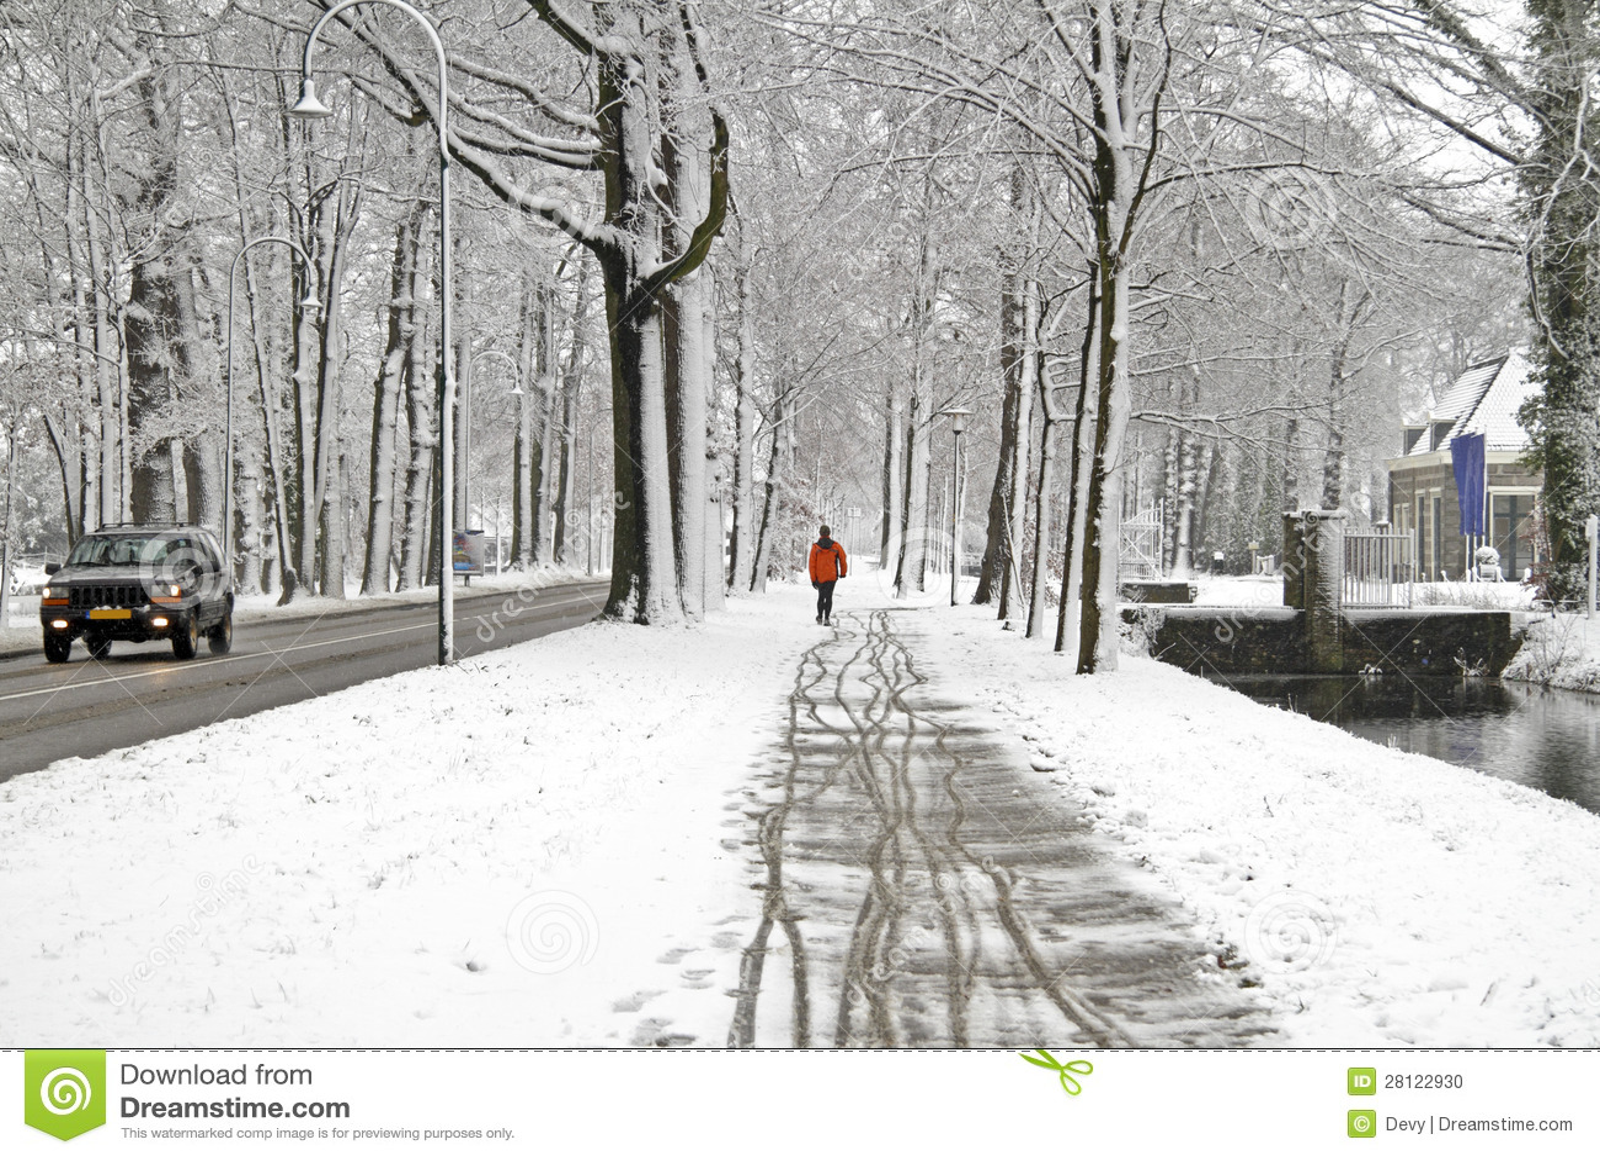 winter in the netherlands stock photo image of walking. Black Bedroom Furniture Sets. Home Design Ideas